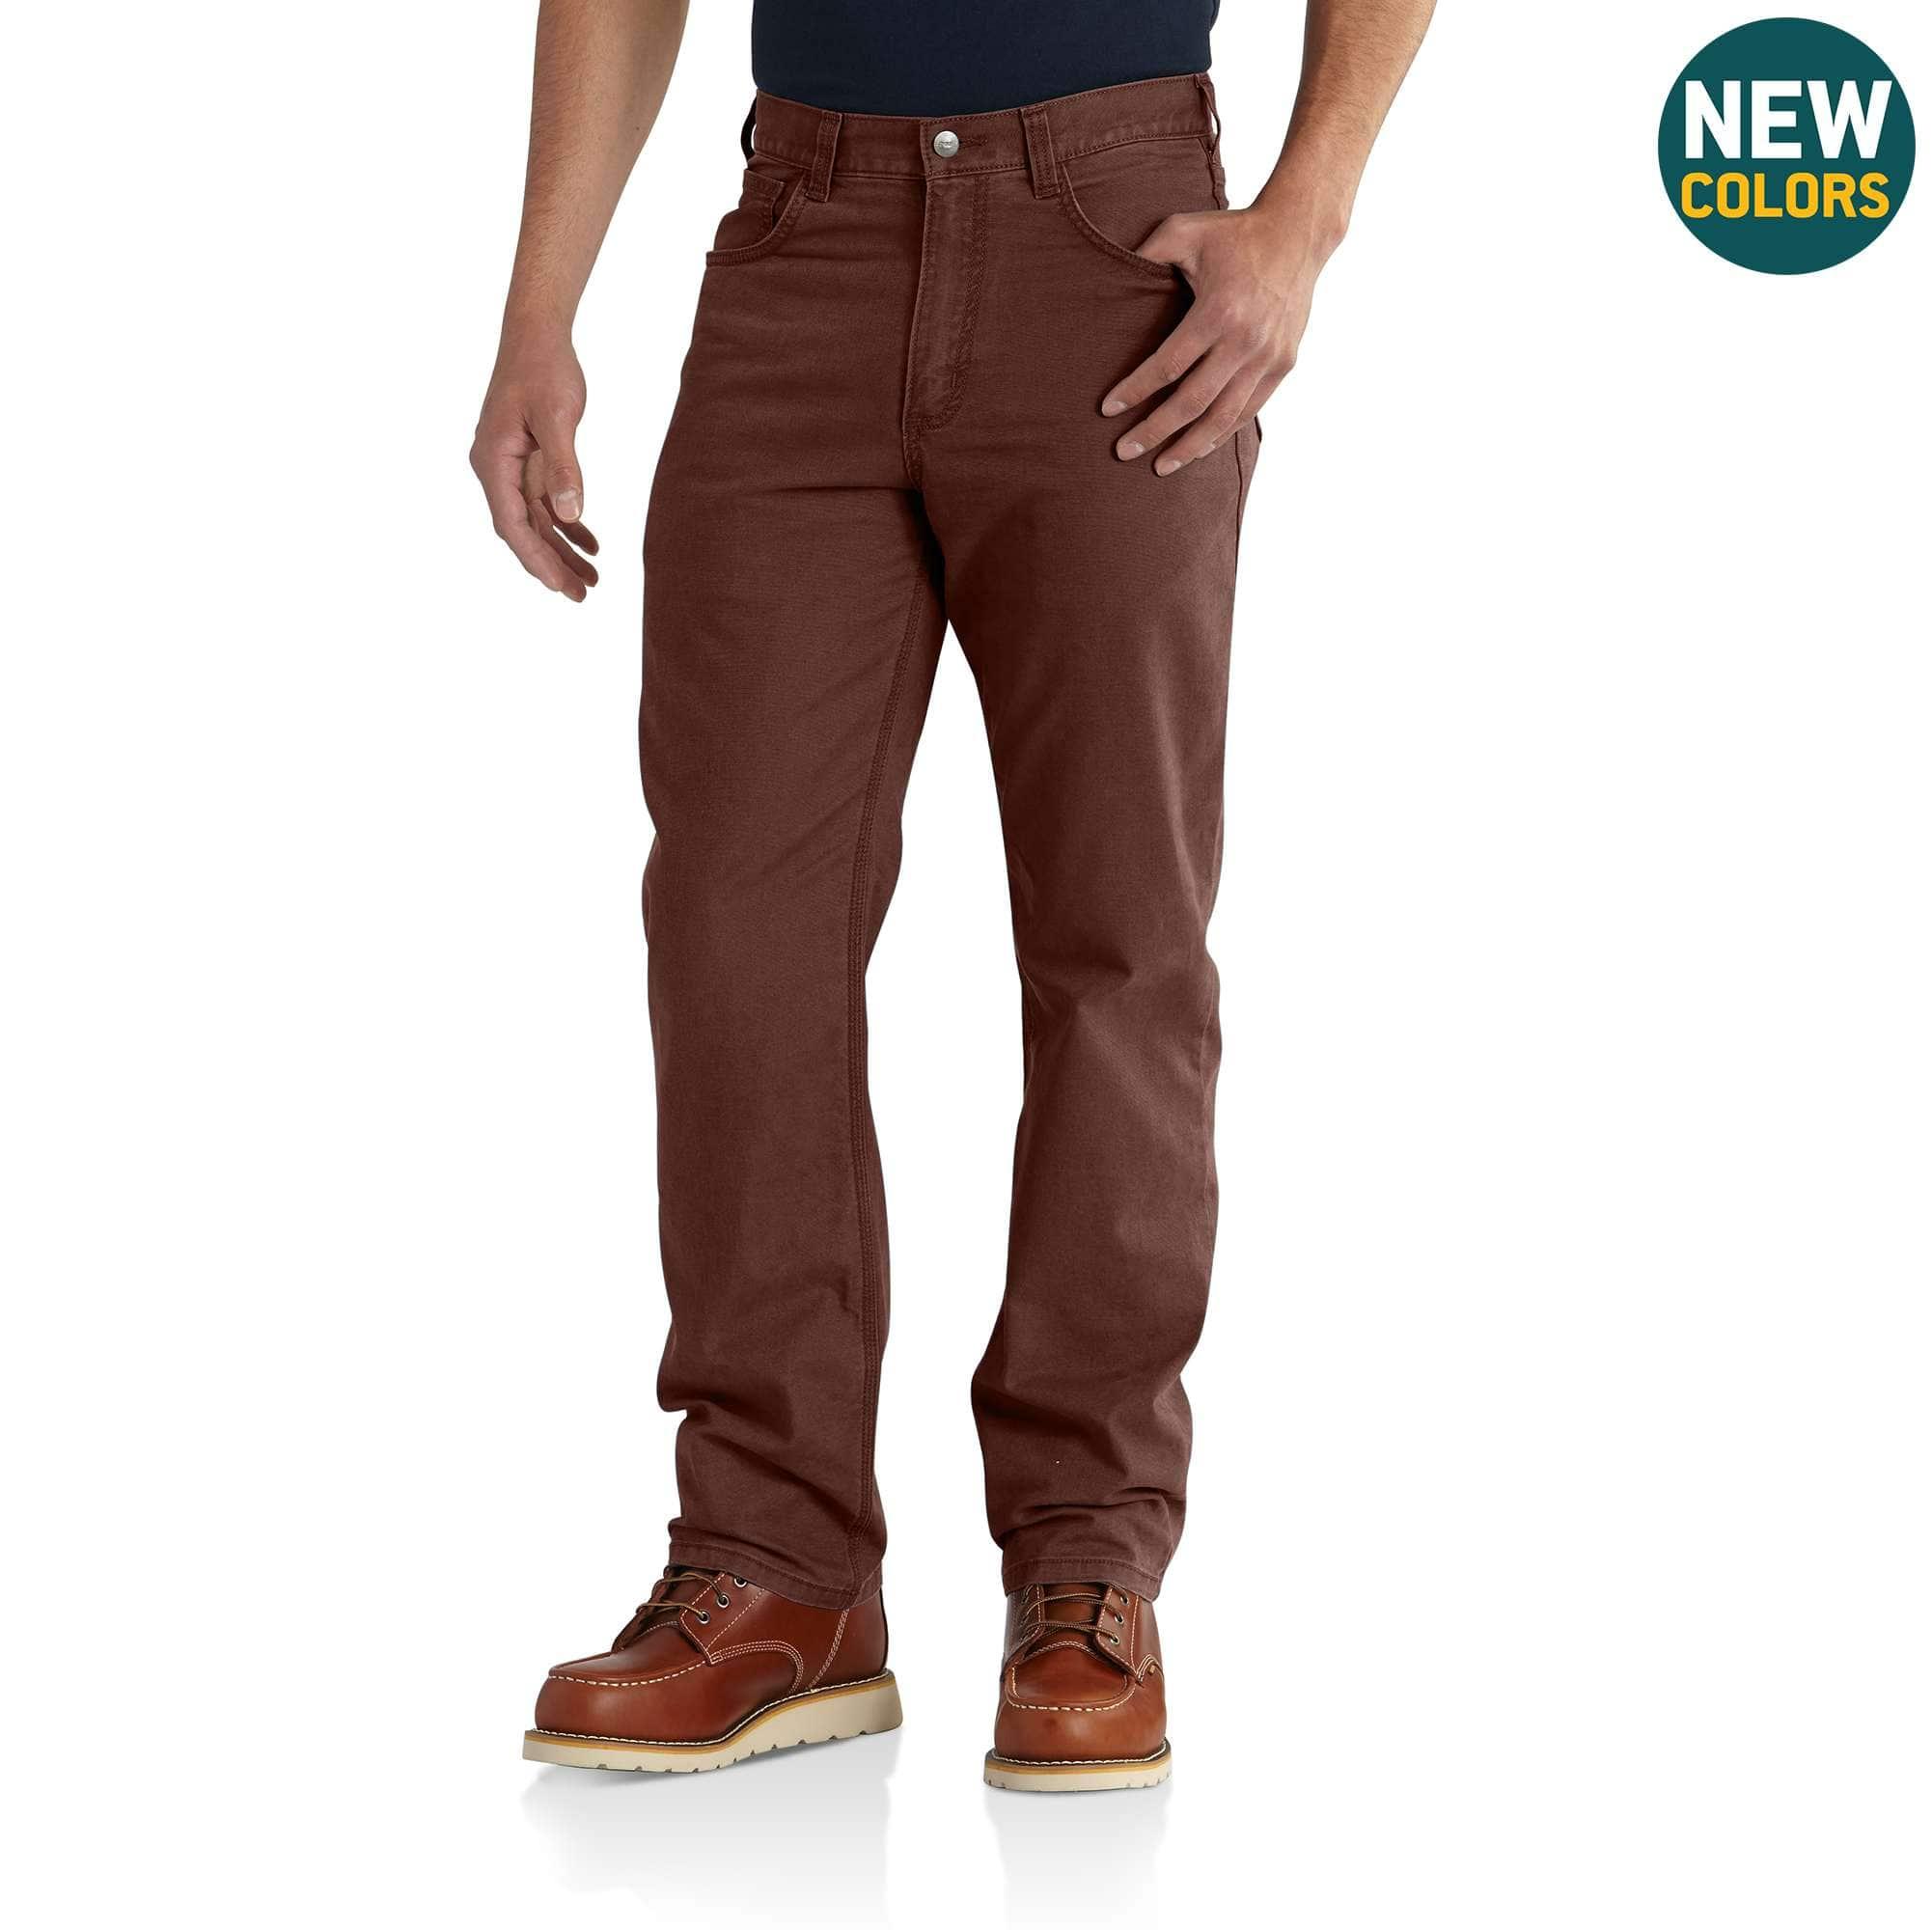 New Mens Tuff Stuff Pro Work Knee Pad Trouser Pockets Pouch POCKETS 711  28-44/'/'